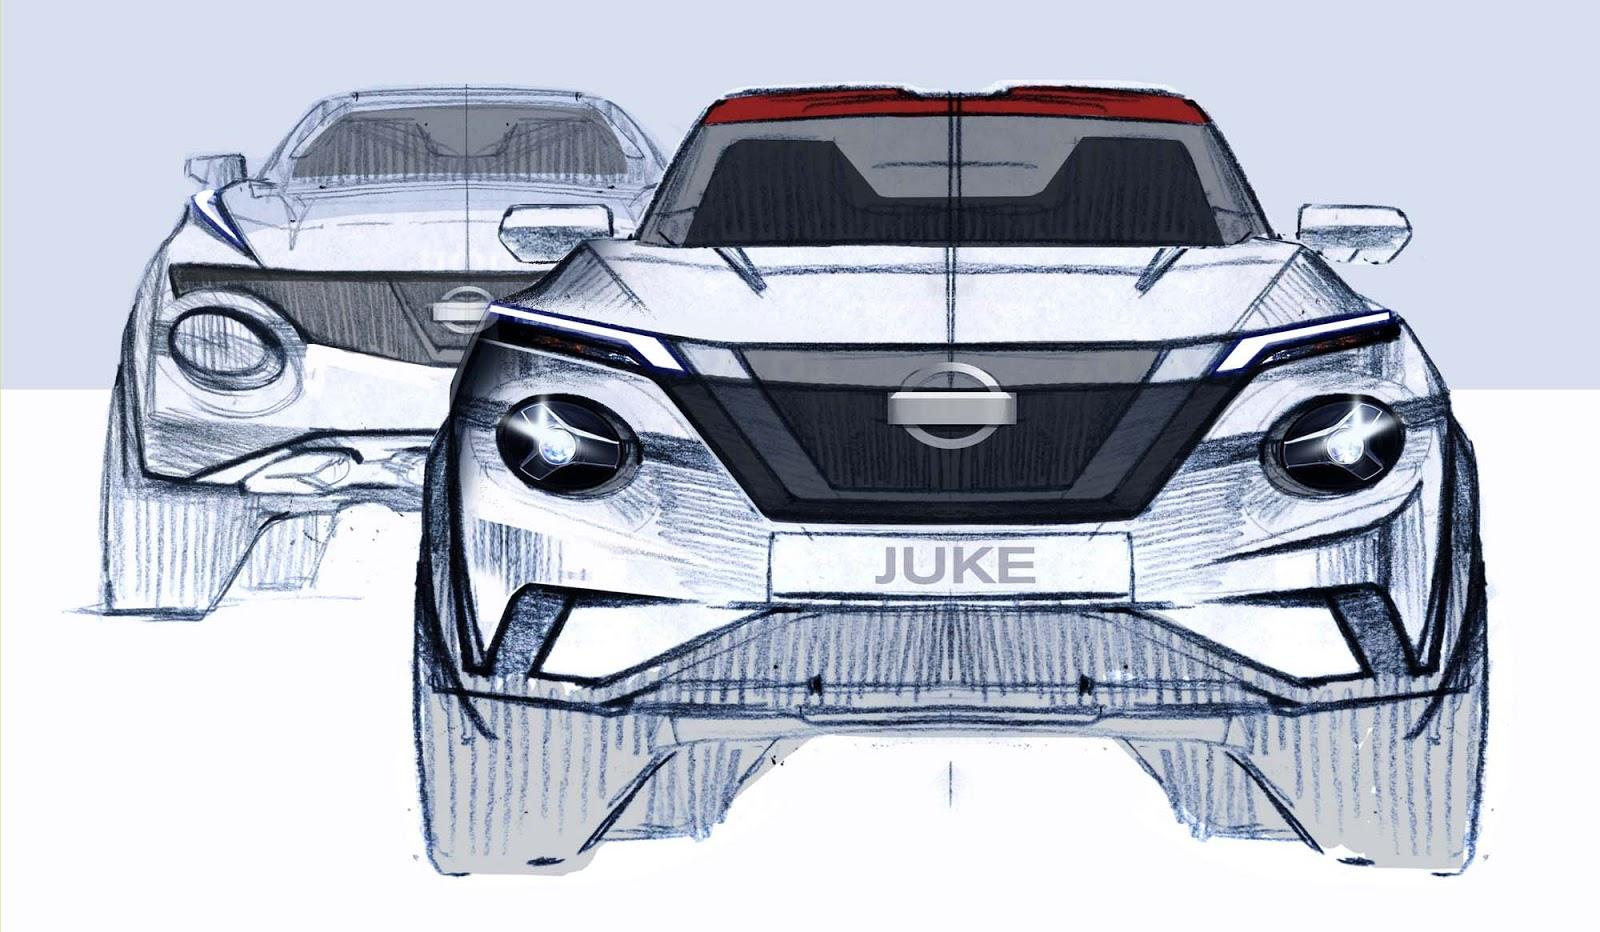 Oct.2B72B 2B2pm2BCET2B To Nissan Juke γιορτάζει τα 10 του χρόνια!